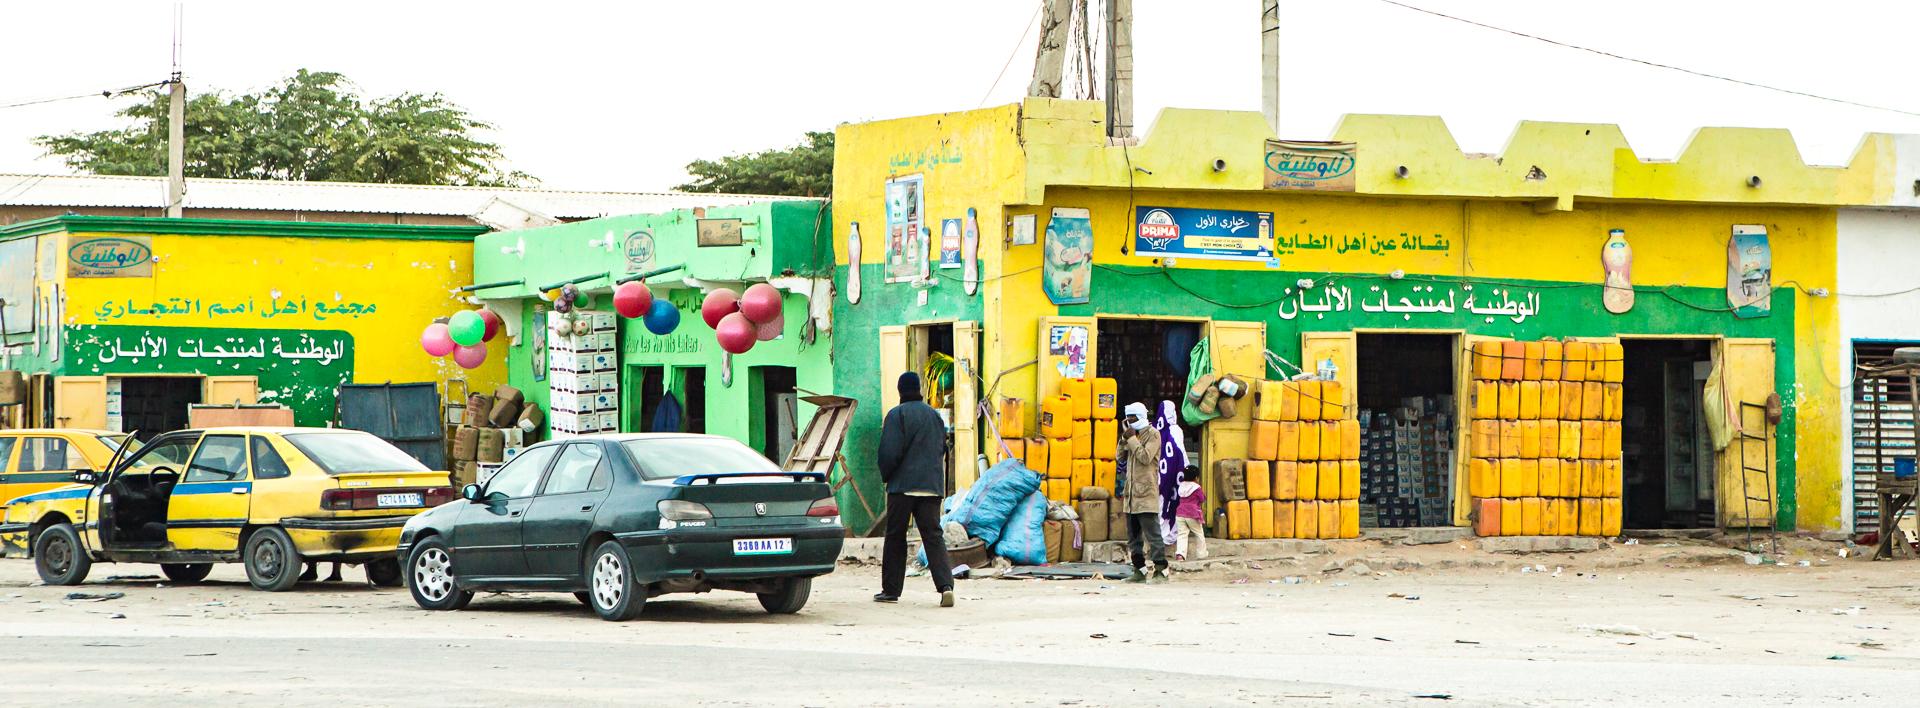 Magasins Nouakchott Mauritanie